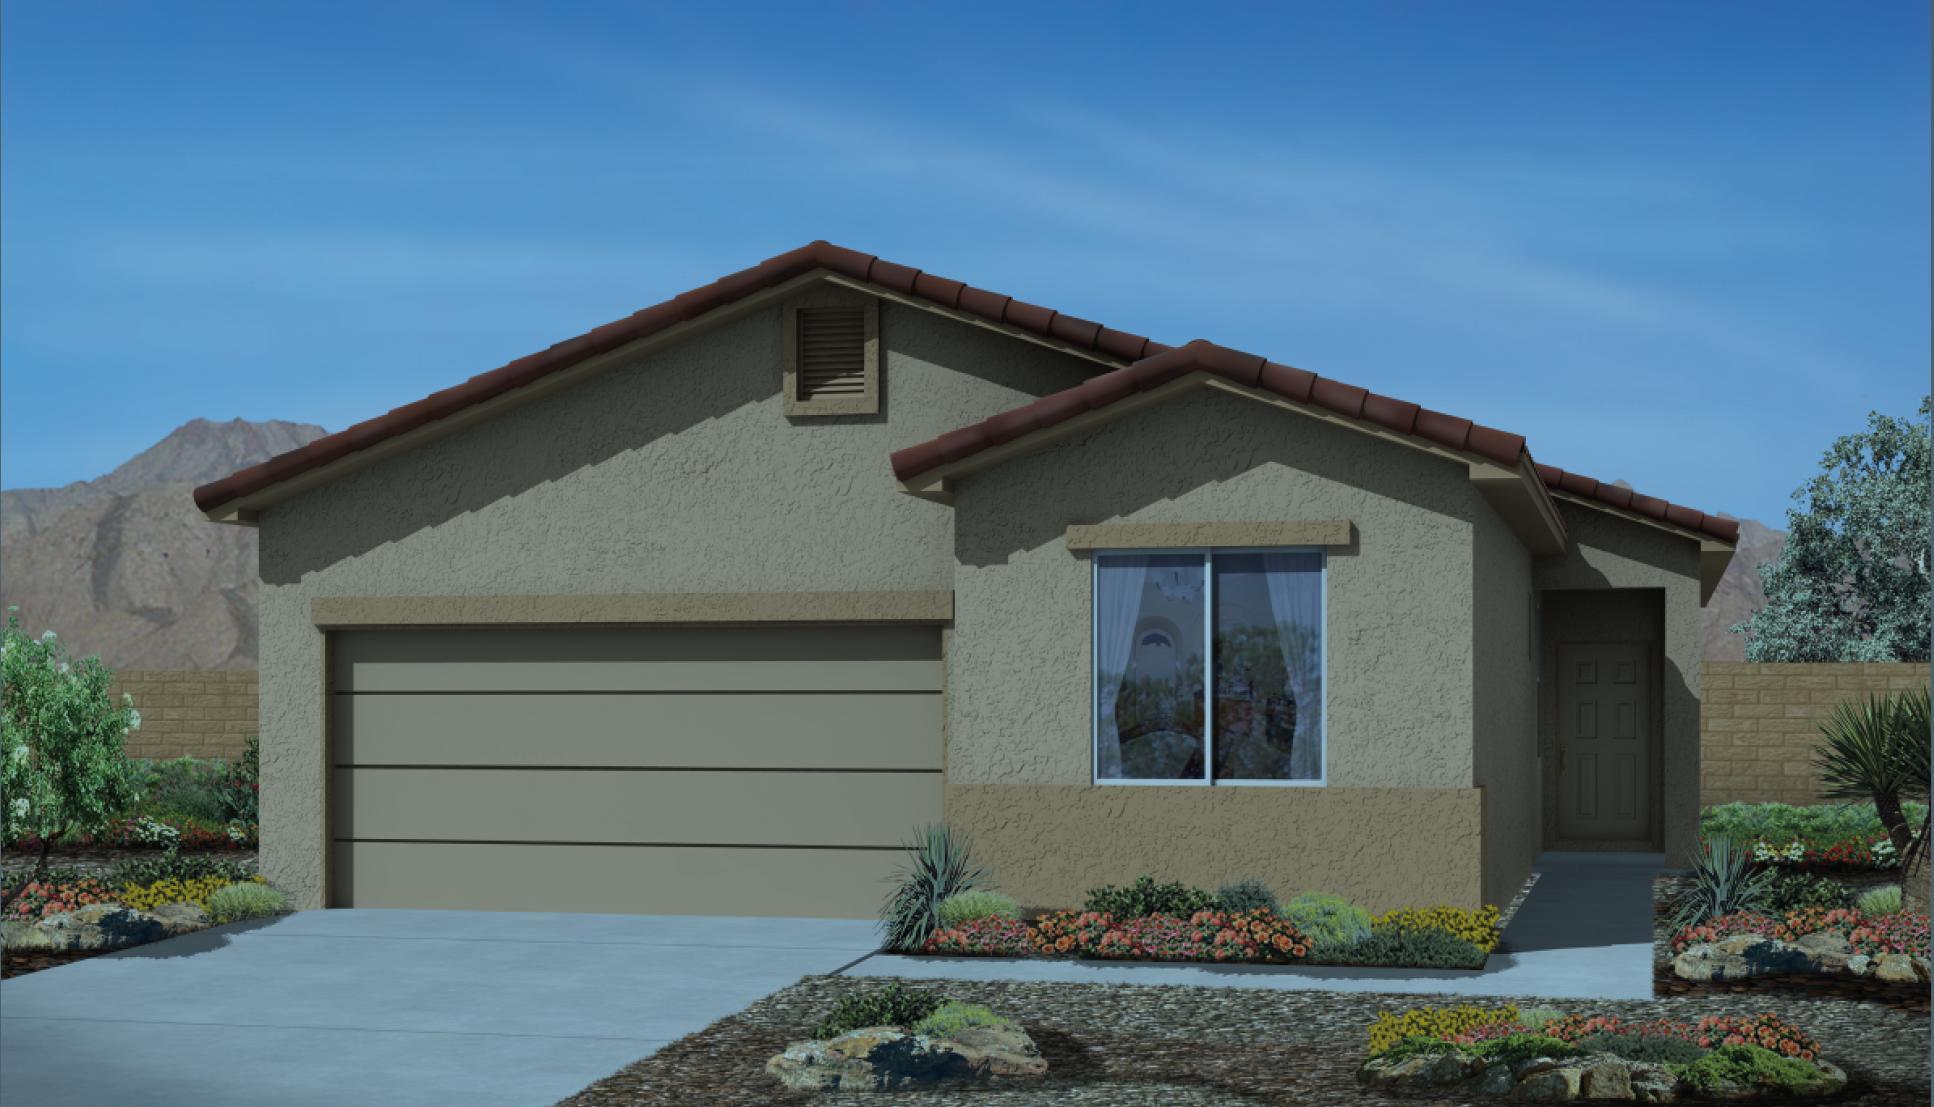 1174 NE Fascination Street, Rio Rancho in Sandoval County, NM 87144 Home for Sale